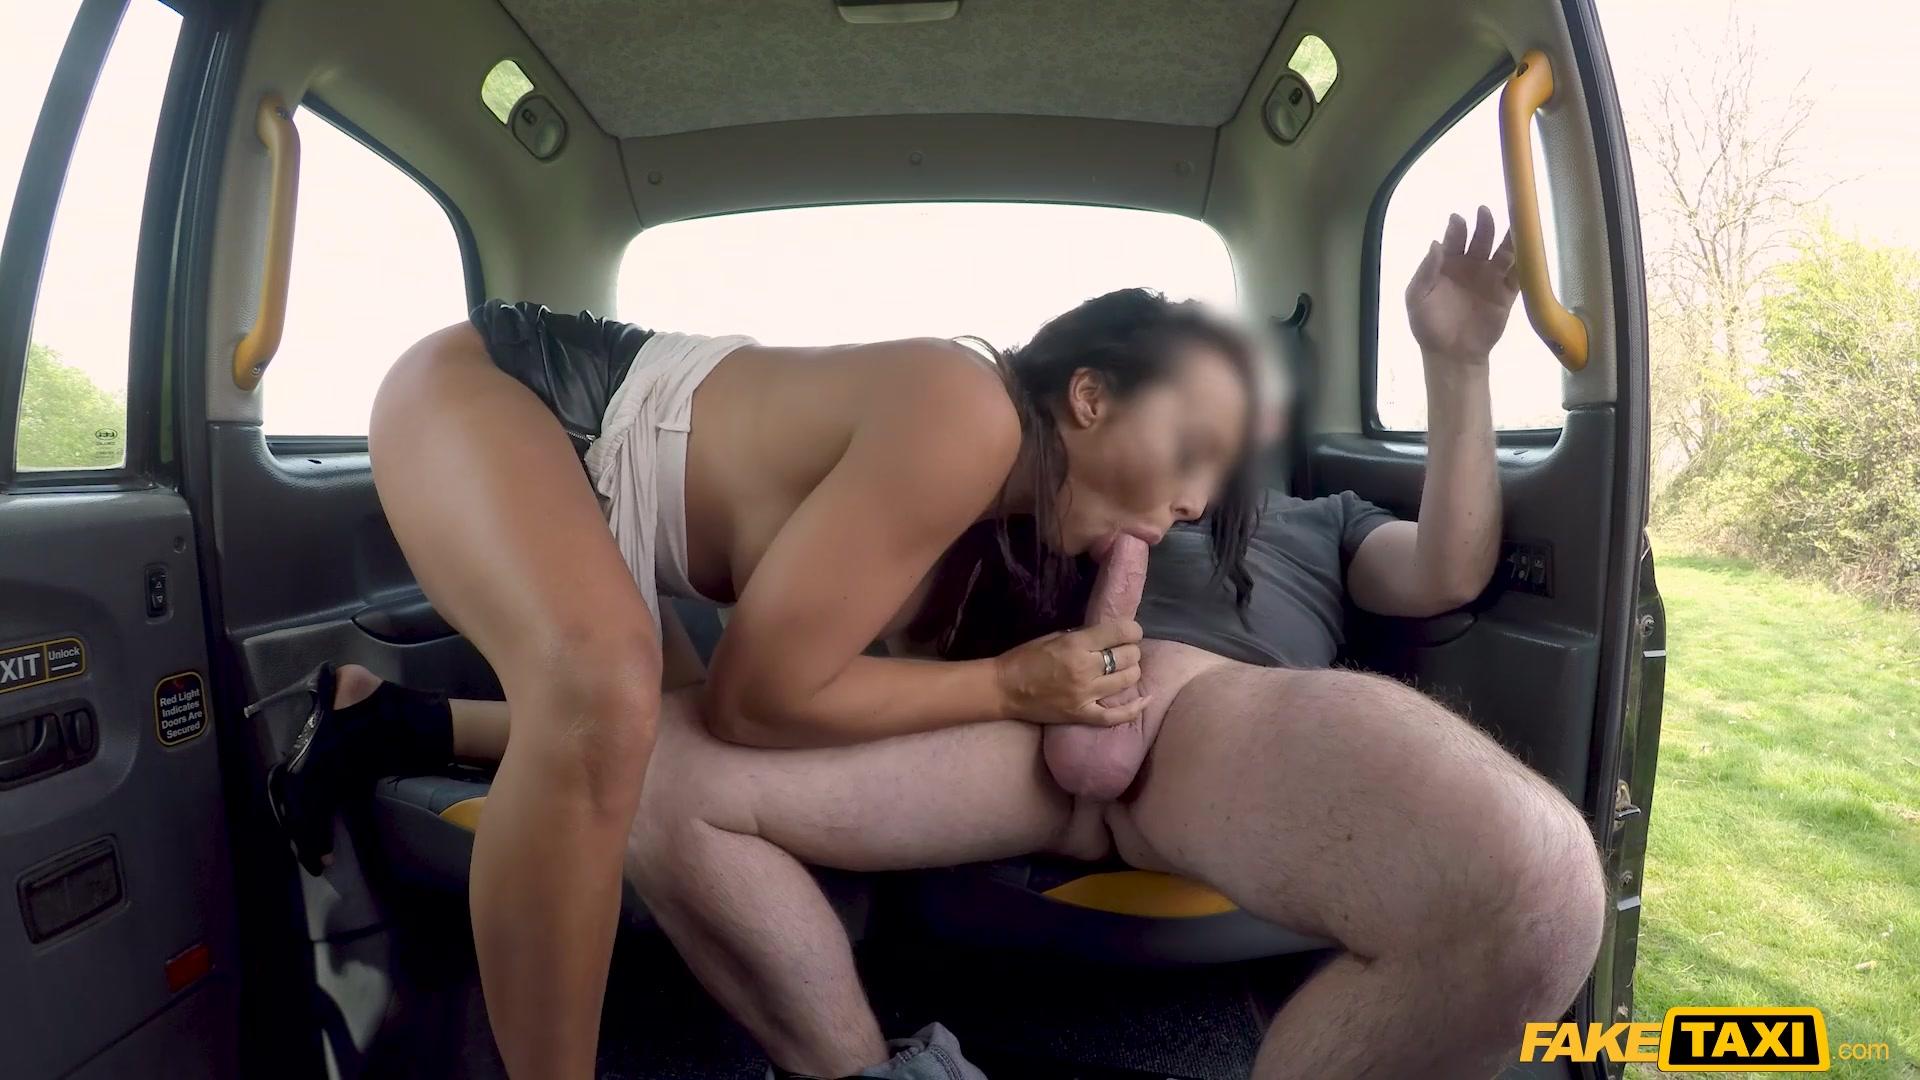 Taxi 69 Sex